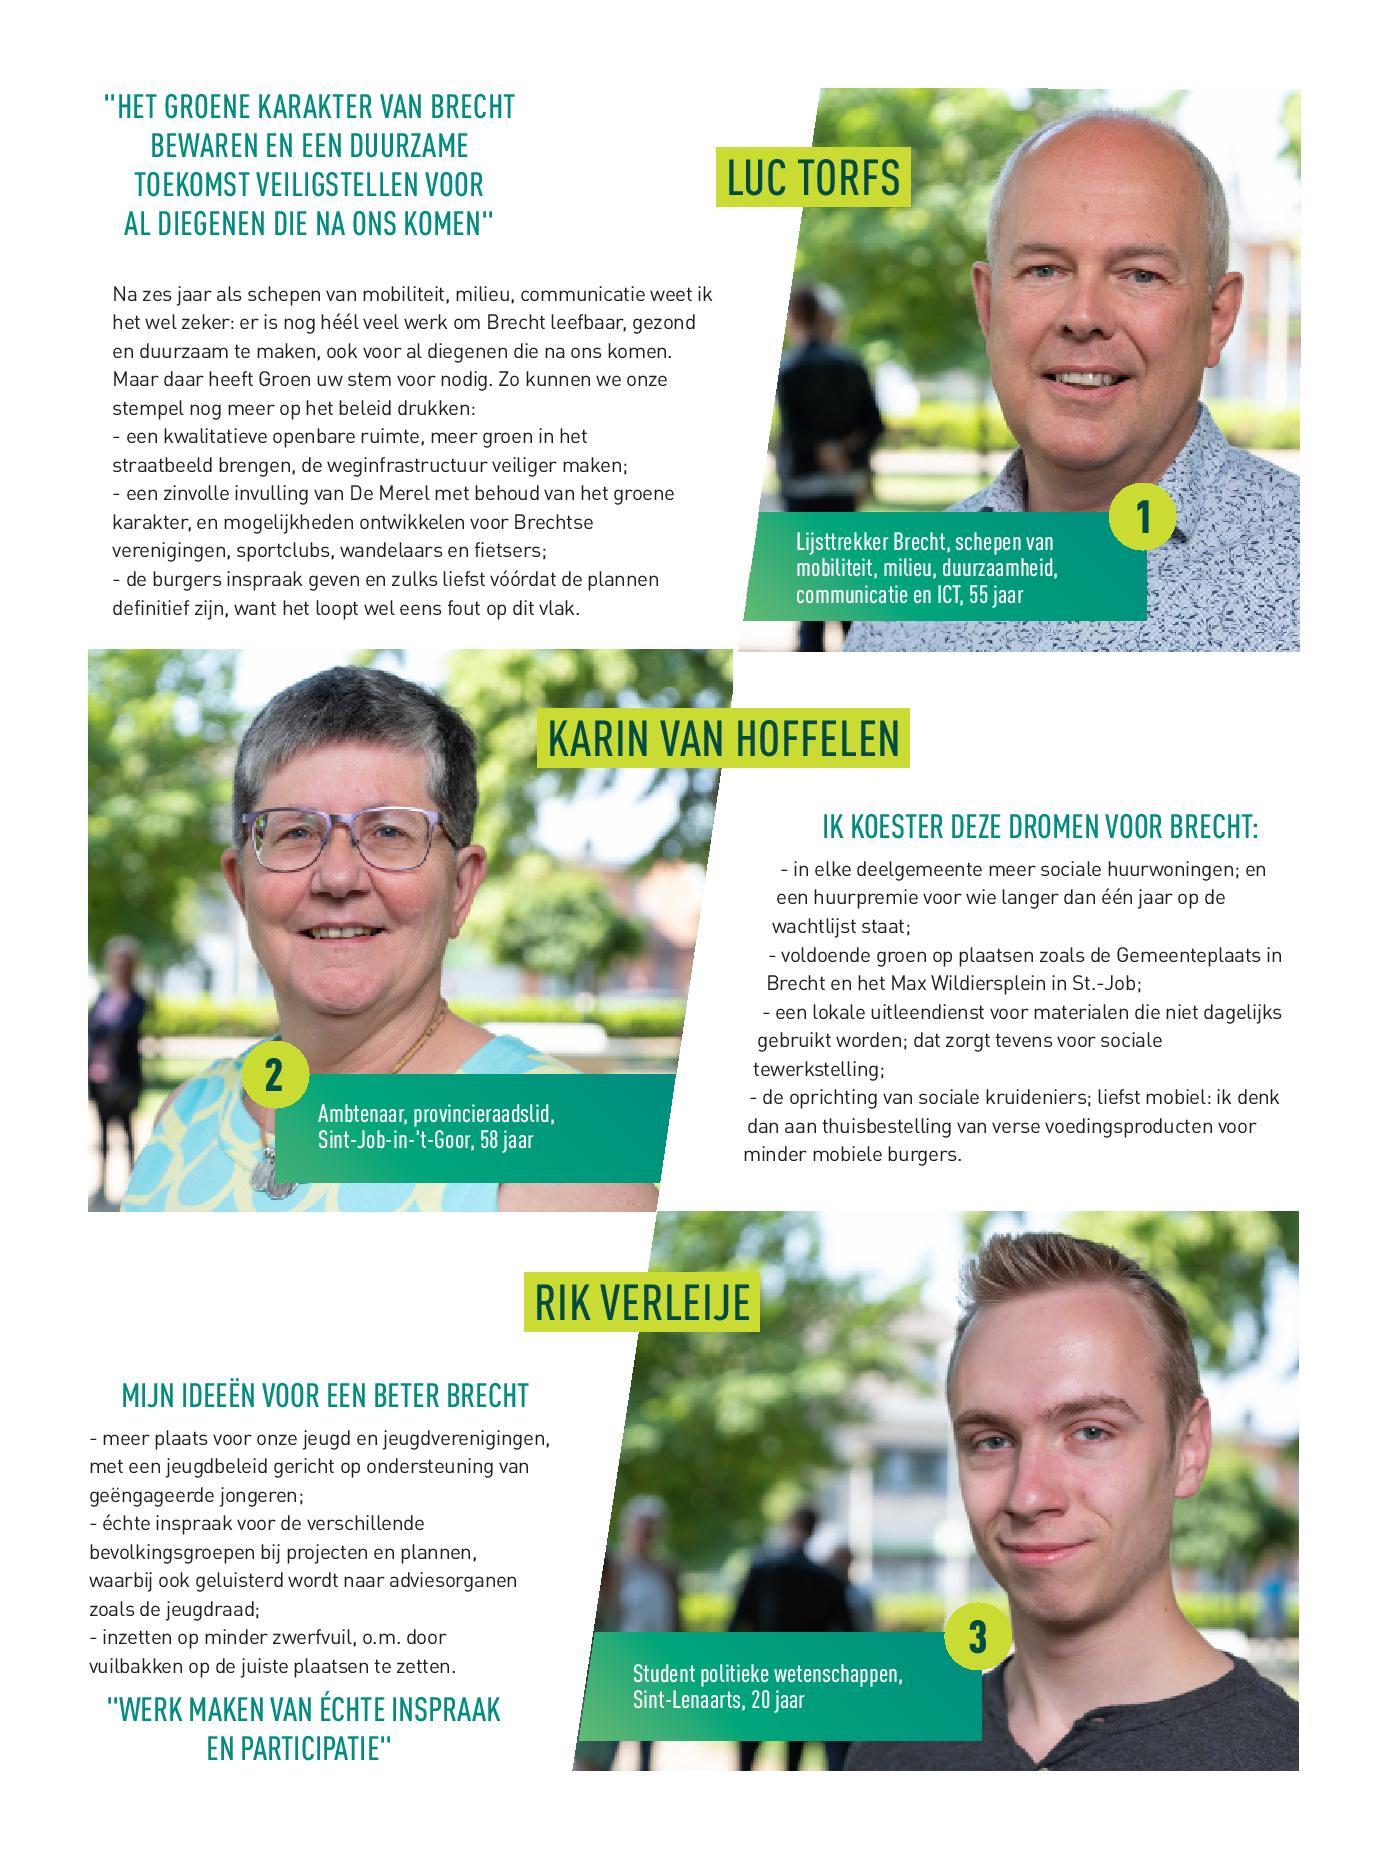 Groen_ANT_V1_Brecht_201810_(2)-page-005.jpg